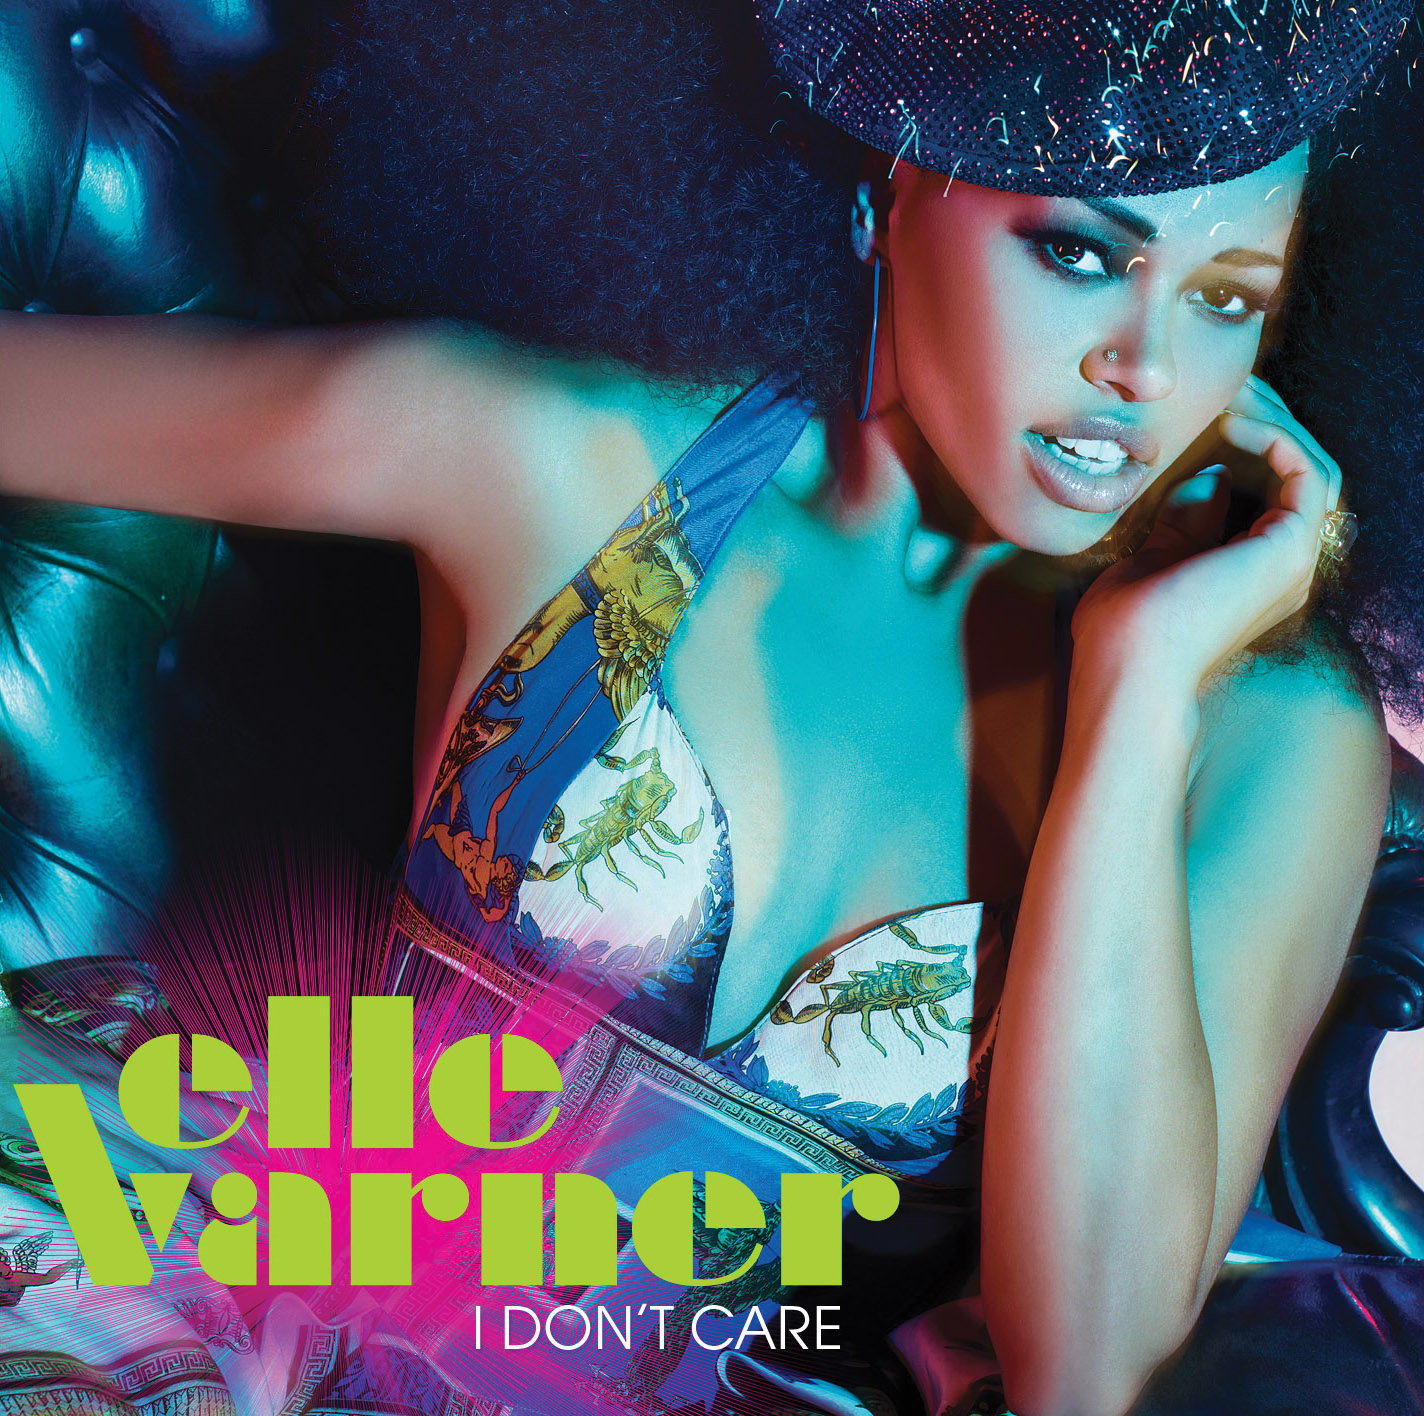 Elle Varner Photoshoot 2012 New Song: Elle ...